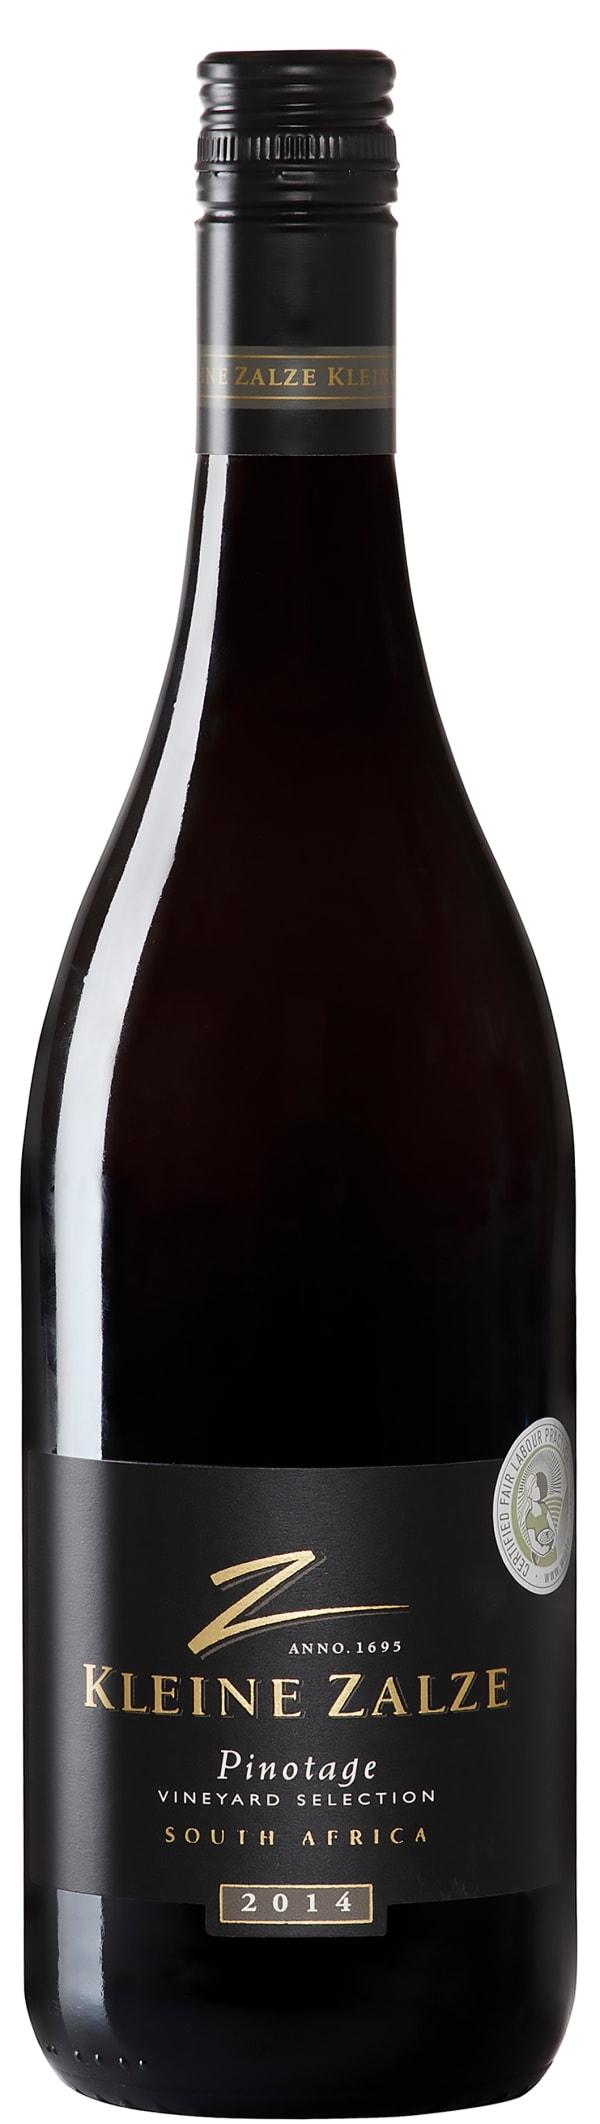 Kleine Zalze Vineyard Selection Pinotage 2016